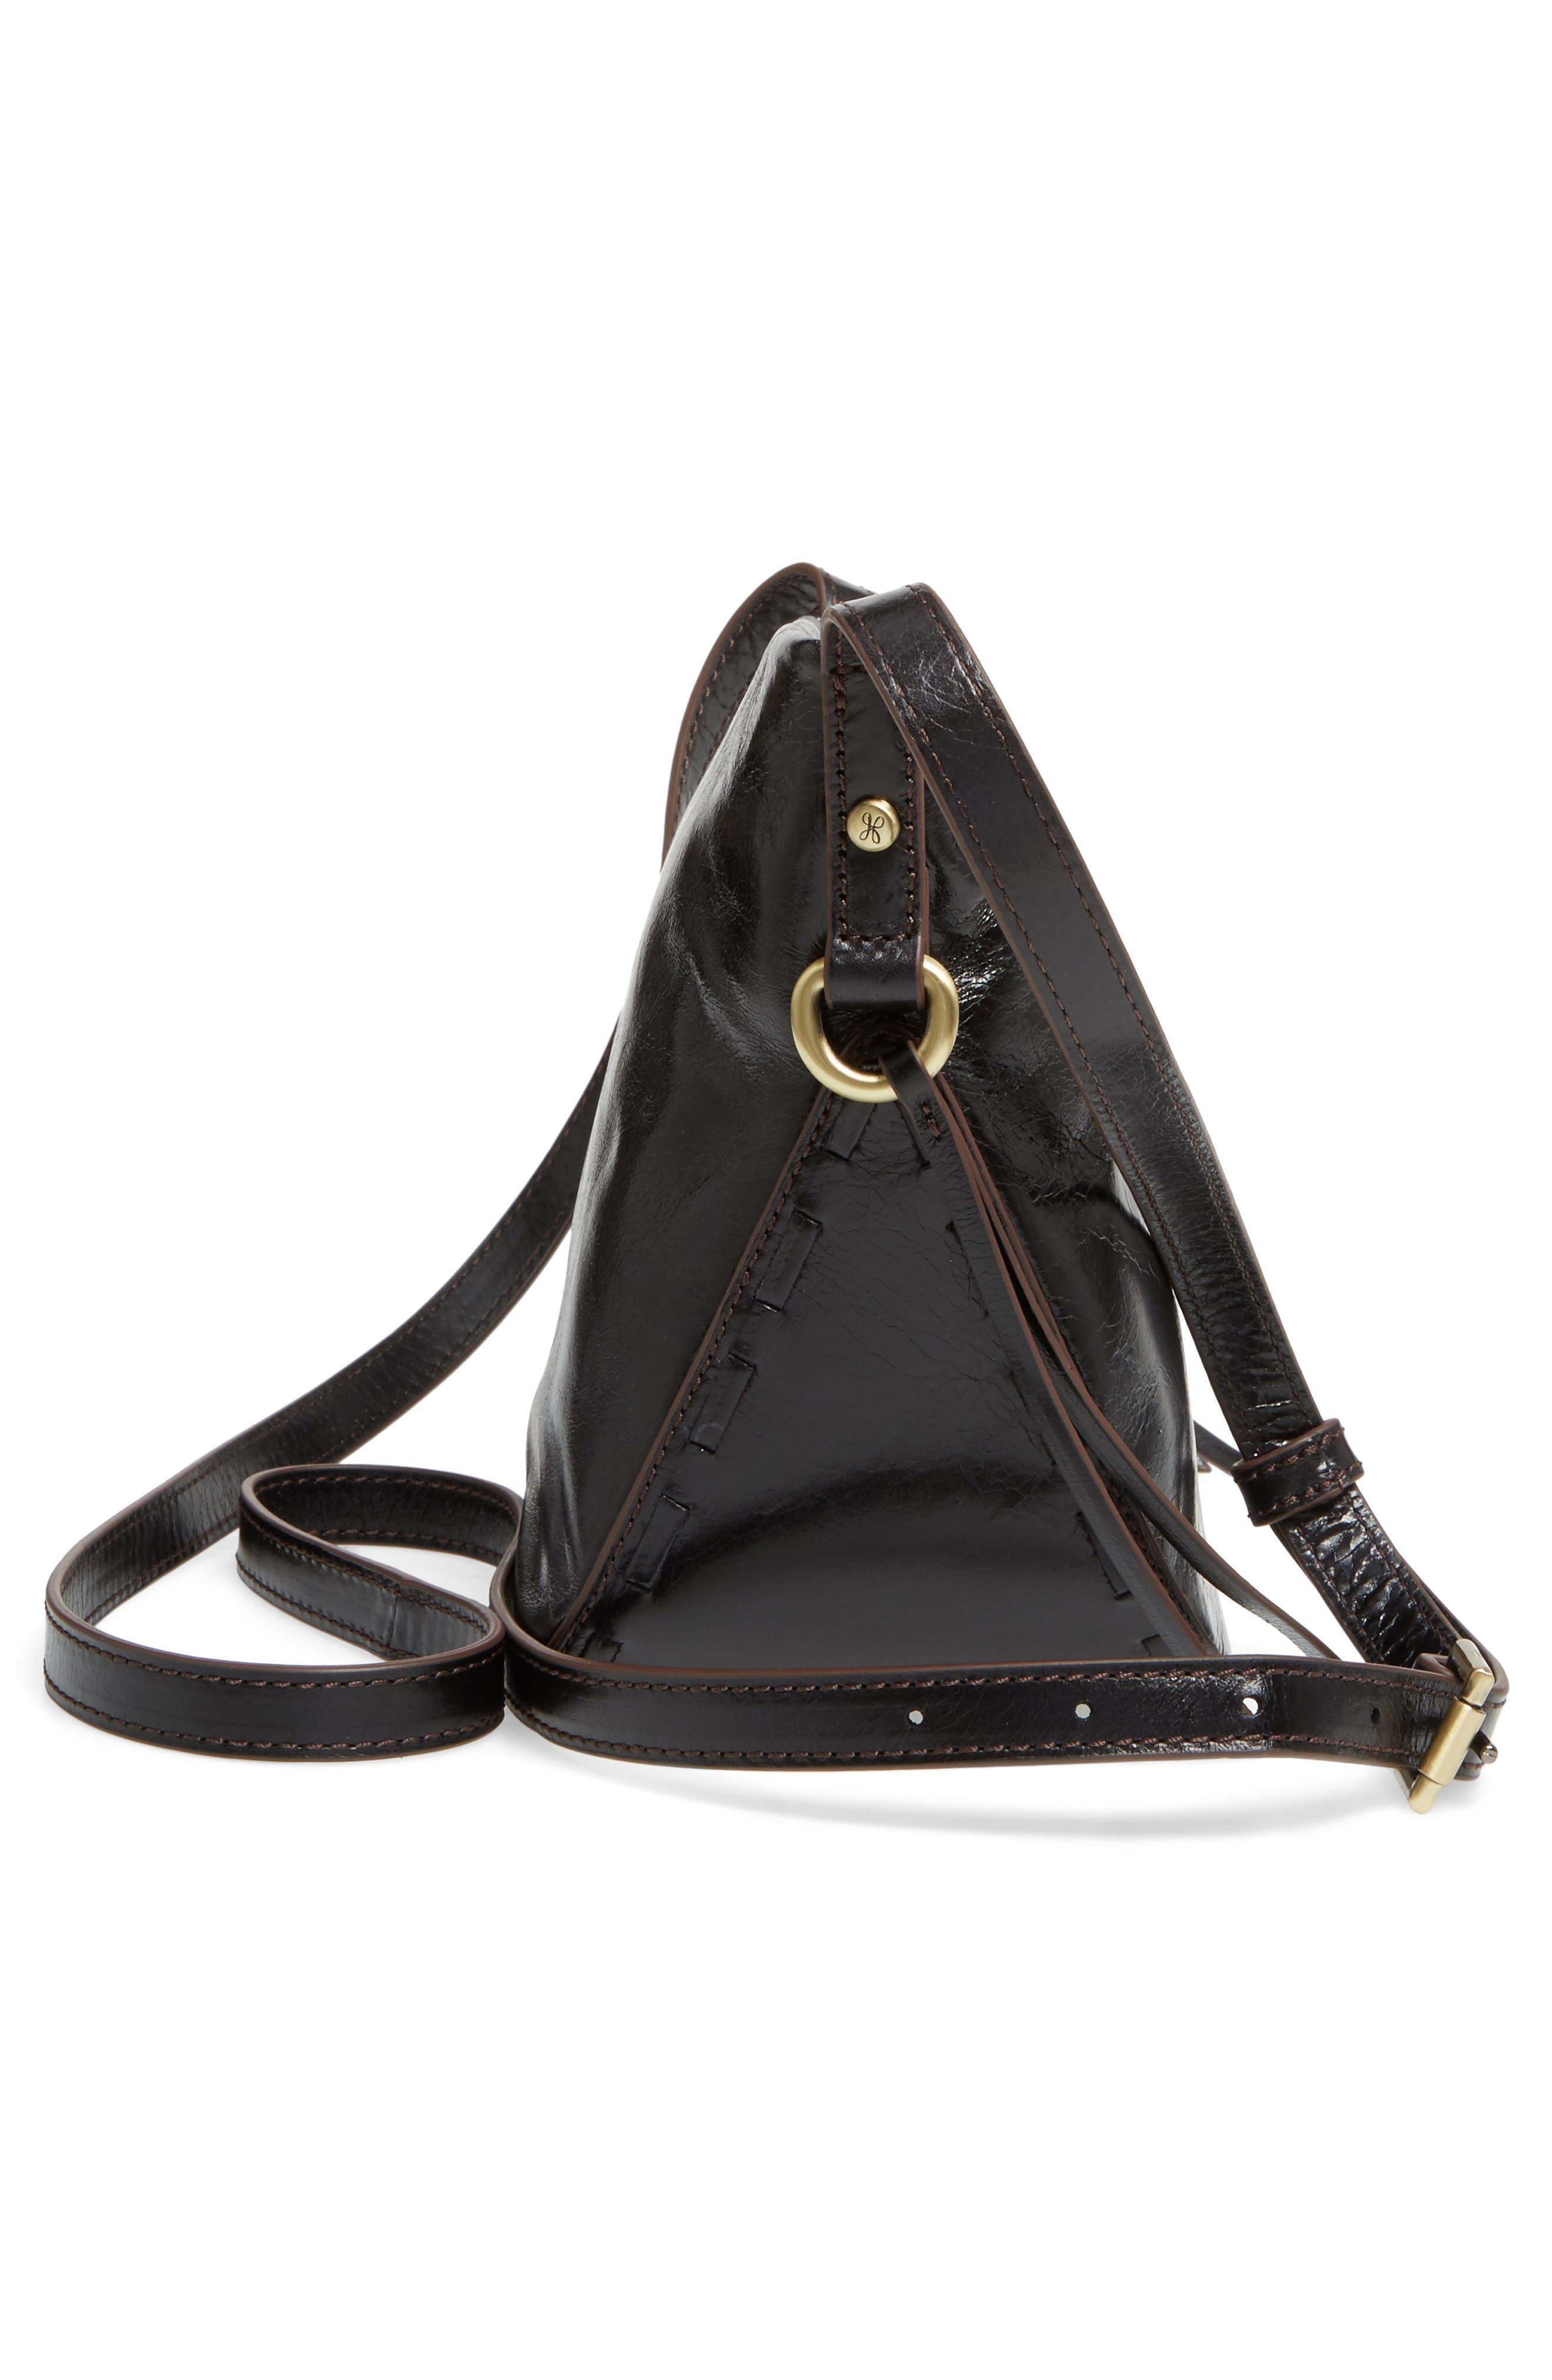 Muse Calfskin Leather Crossbody Bag,                             Alternate thumbnail 5, color,                             001